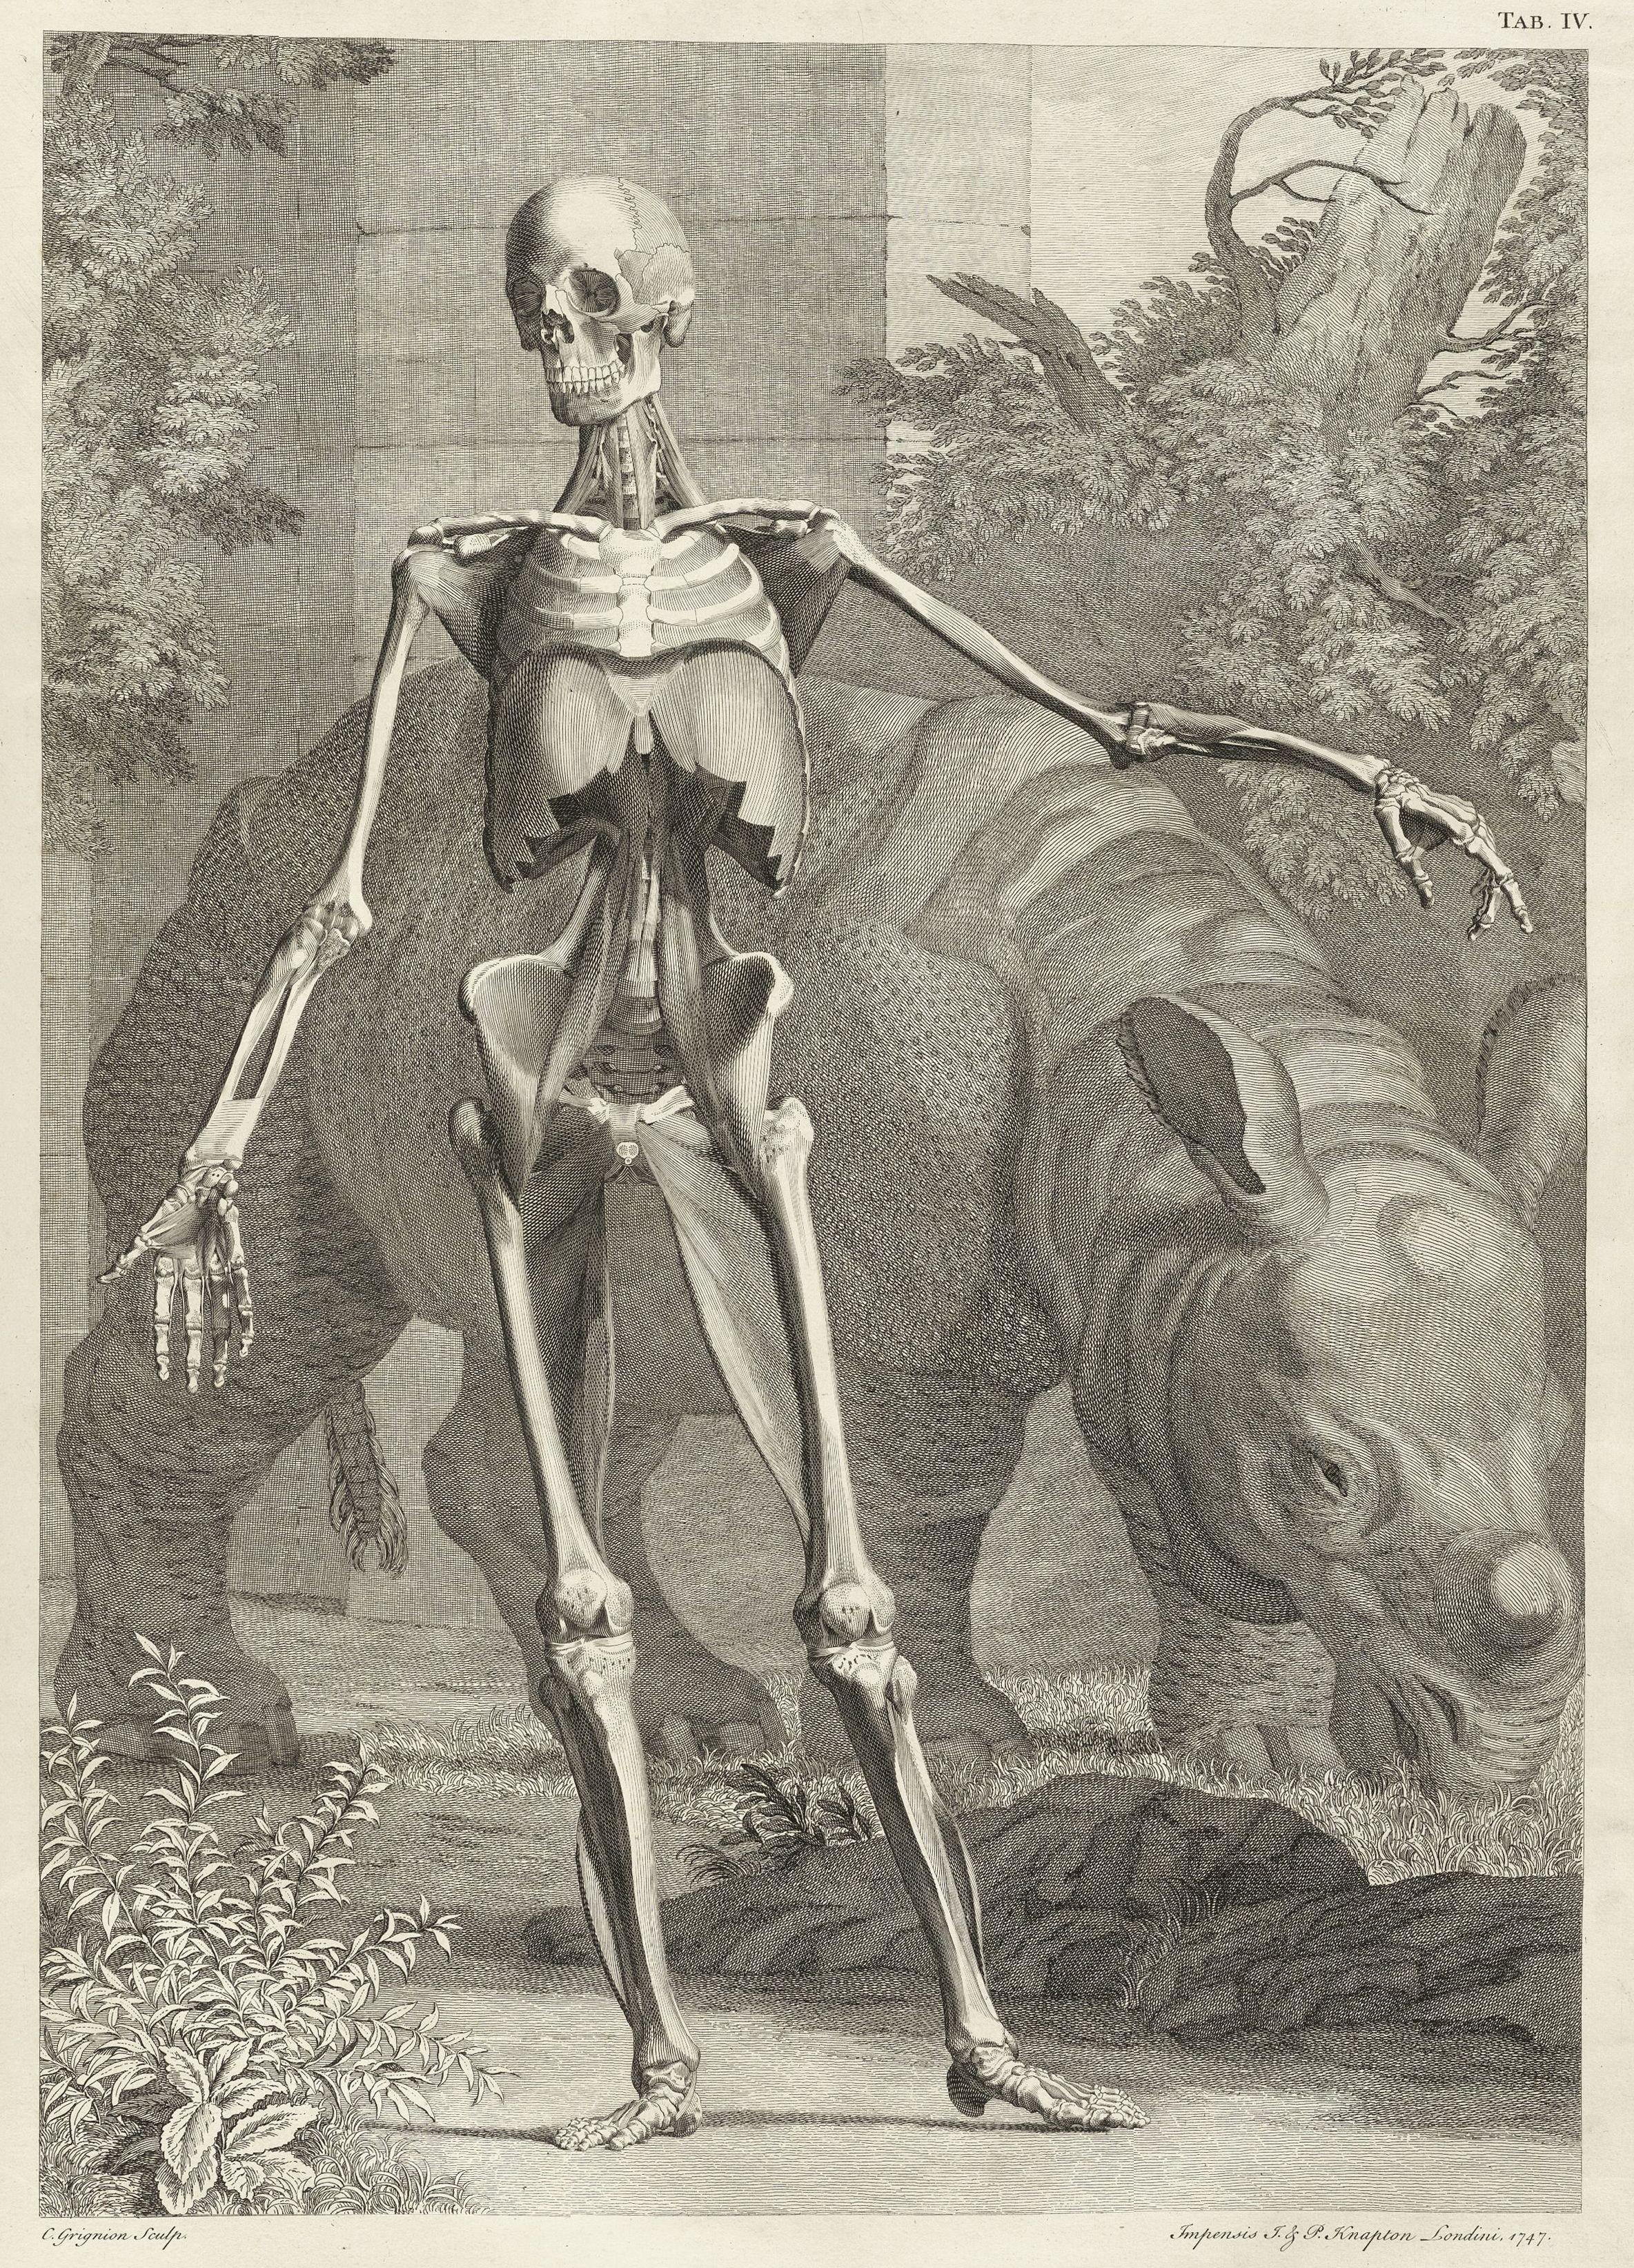 Clara_Rhinoceros_from_Bernhard_Siegfried_Albinus_TAB_IV_-_1749.jpg ...